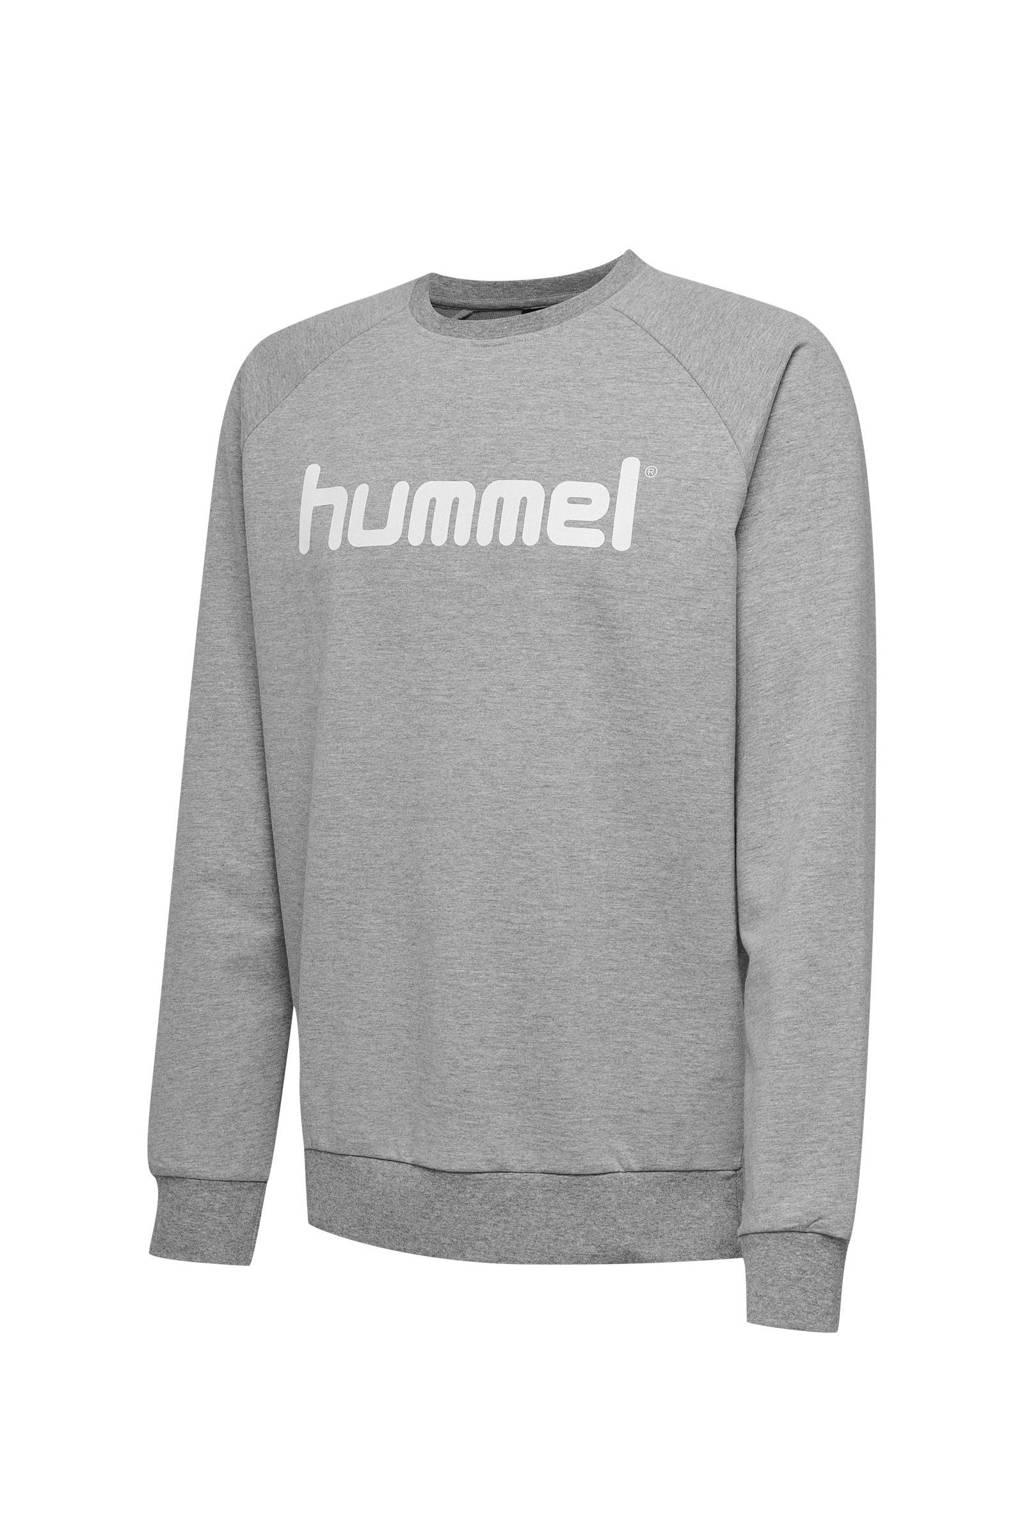 hummel sweater grijs, Grijs